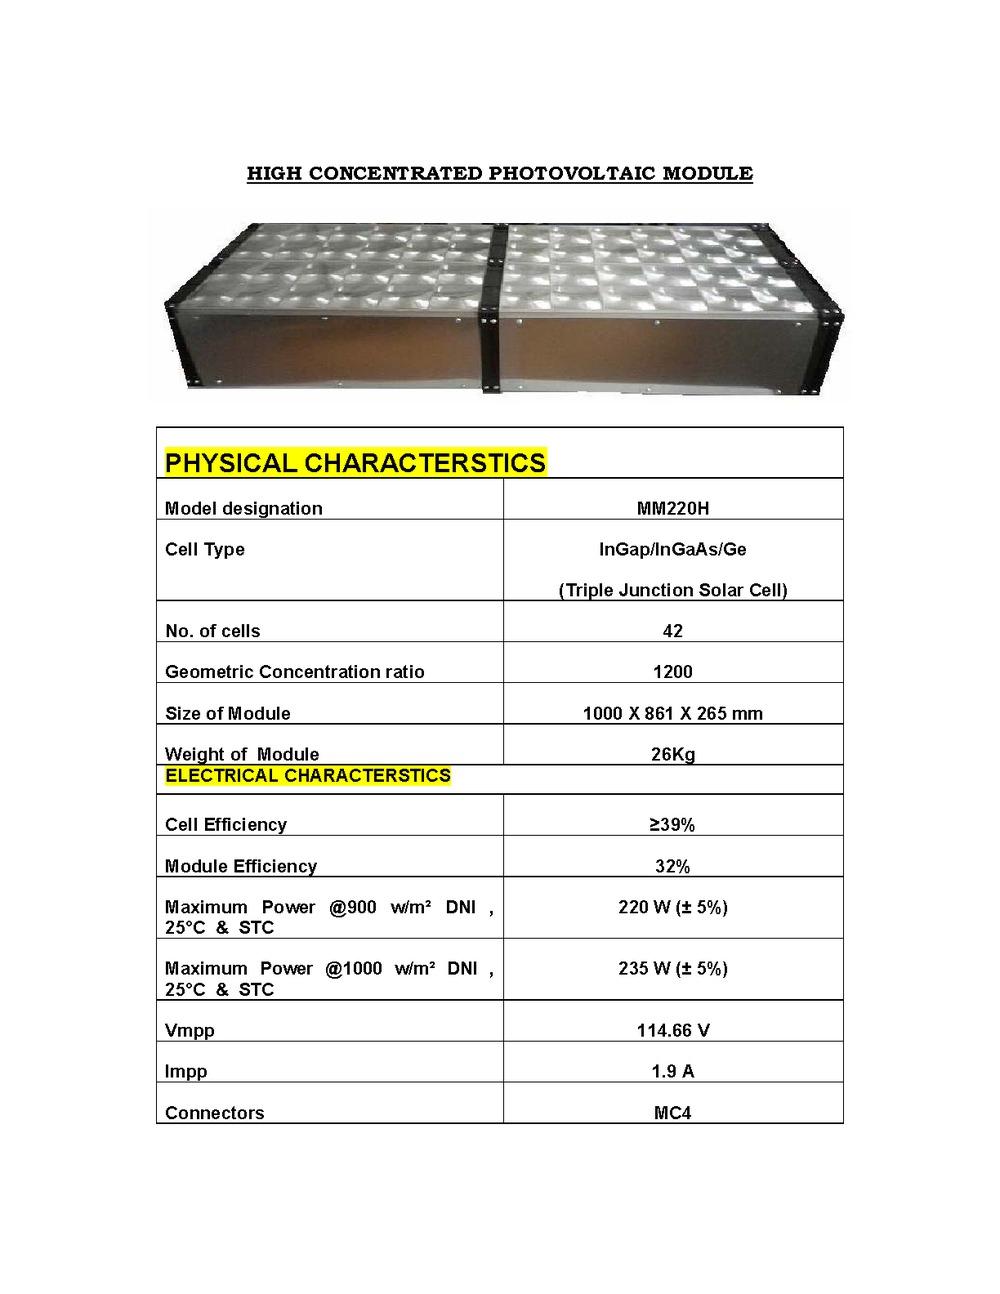 Hcpv module 220w data sheet bigger